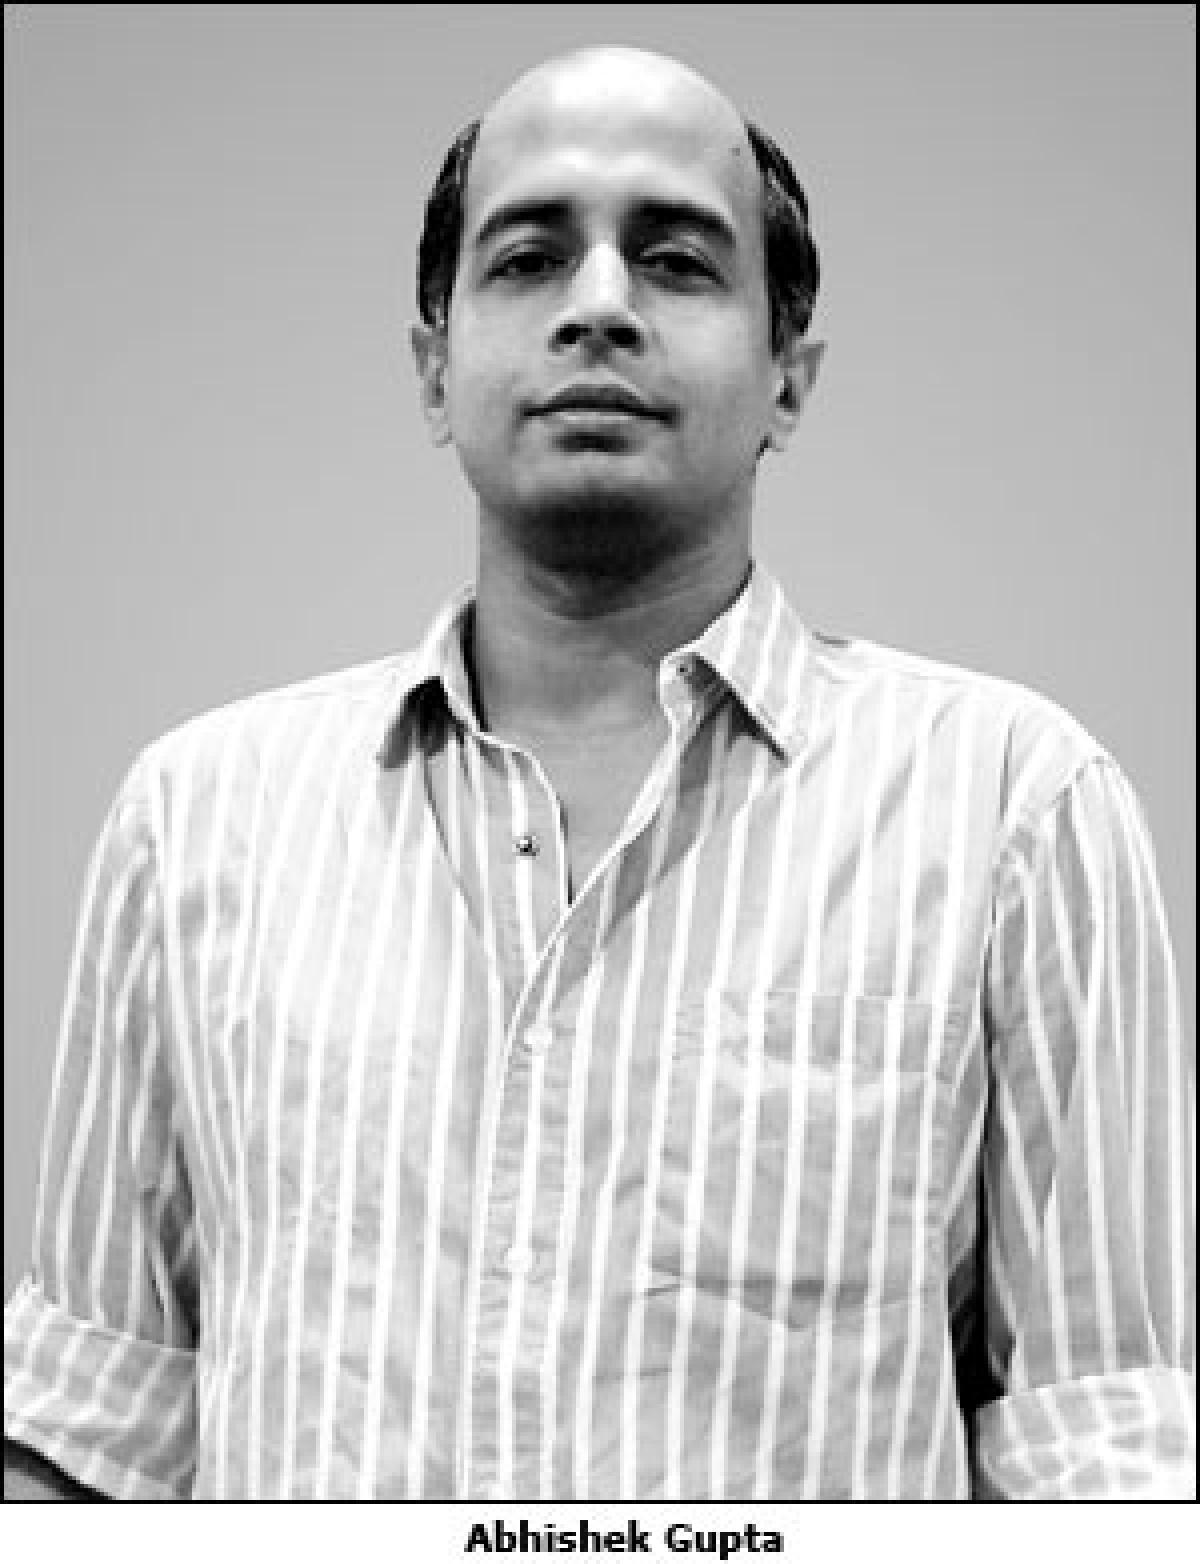 Cheil Worldwide appoints Abhishek Gupta as Digital Creative Director